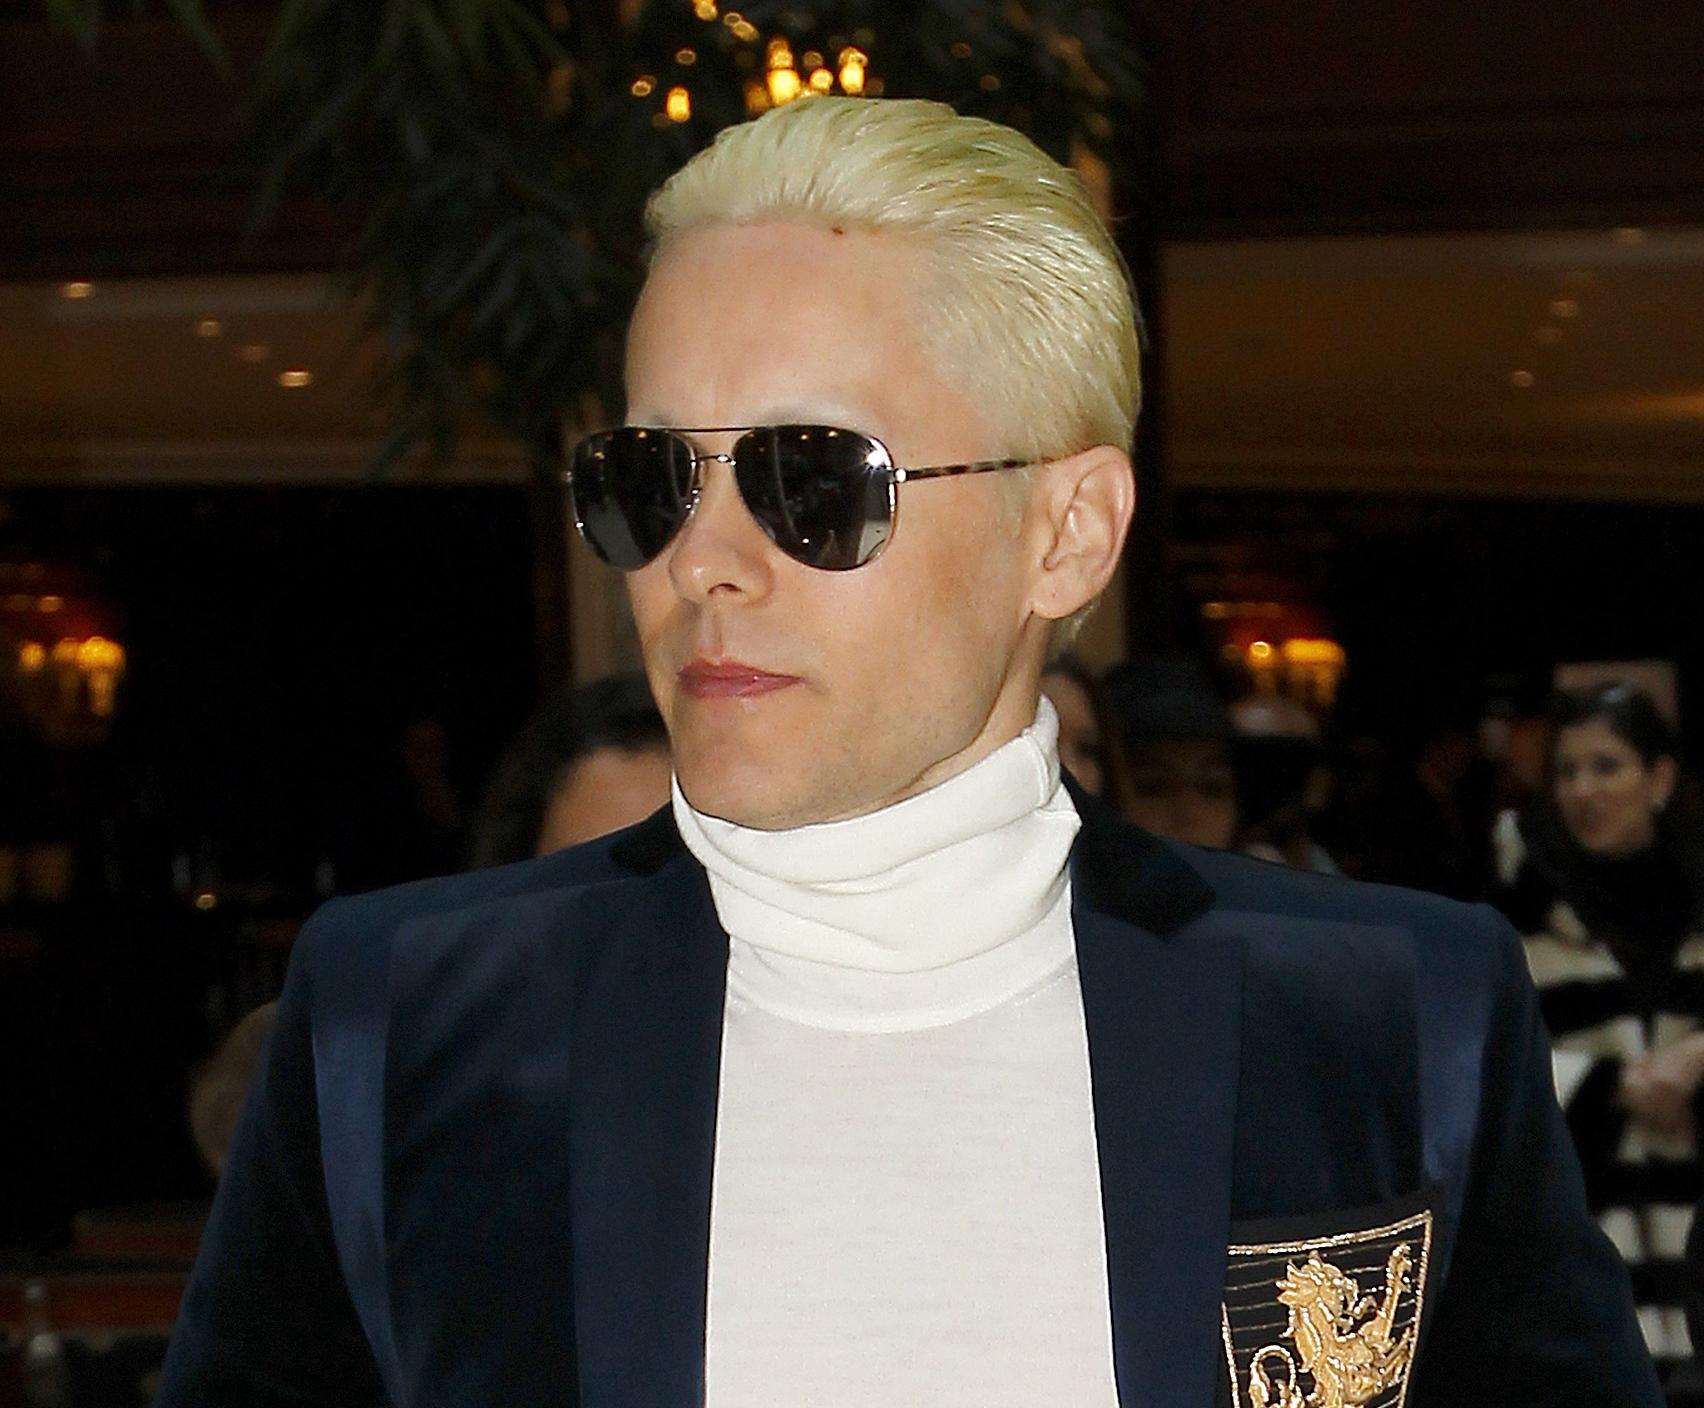 Jared Leto attends Balmain runway in Paris during fall winter Paris fashion week